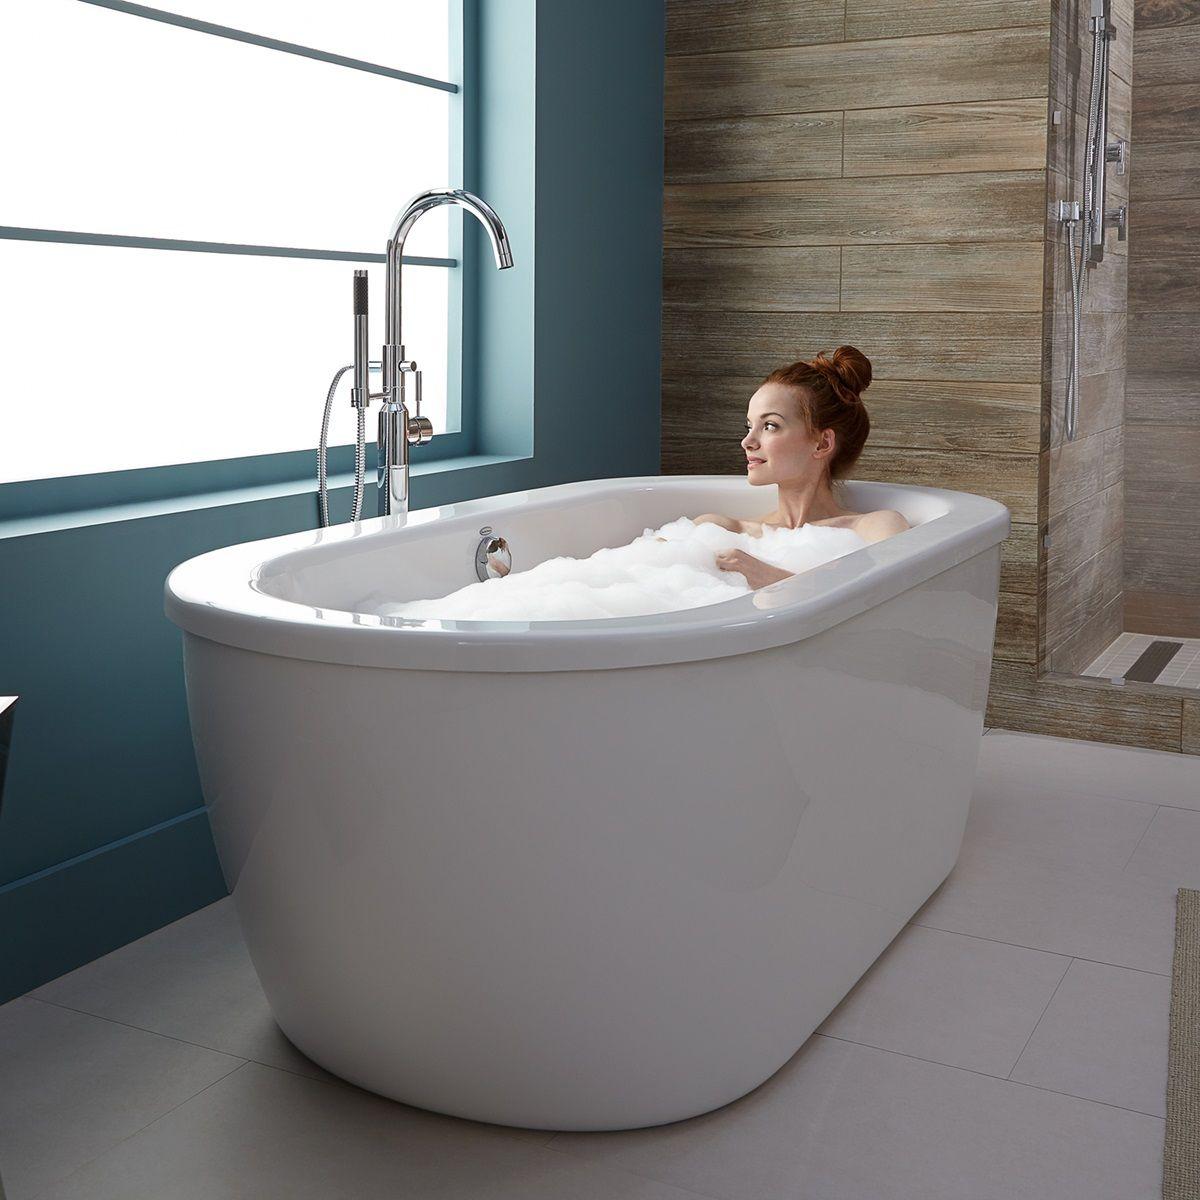 Bathtubs - Cadet Freestanding Tub - Arctic American Standard ...